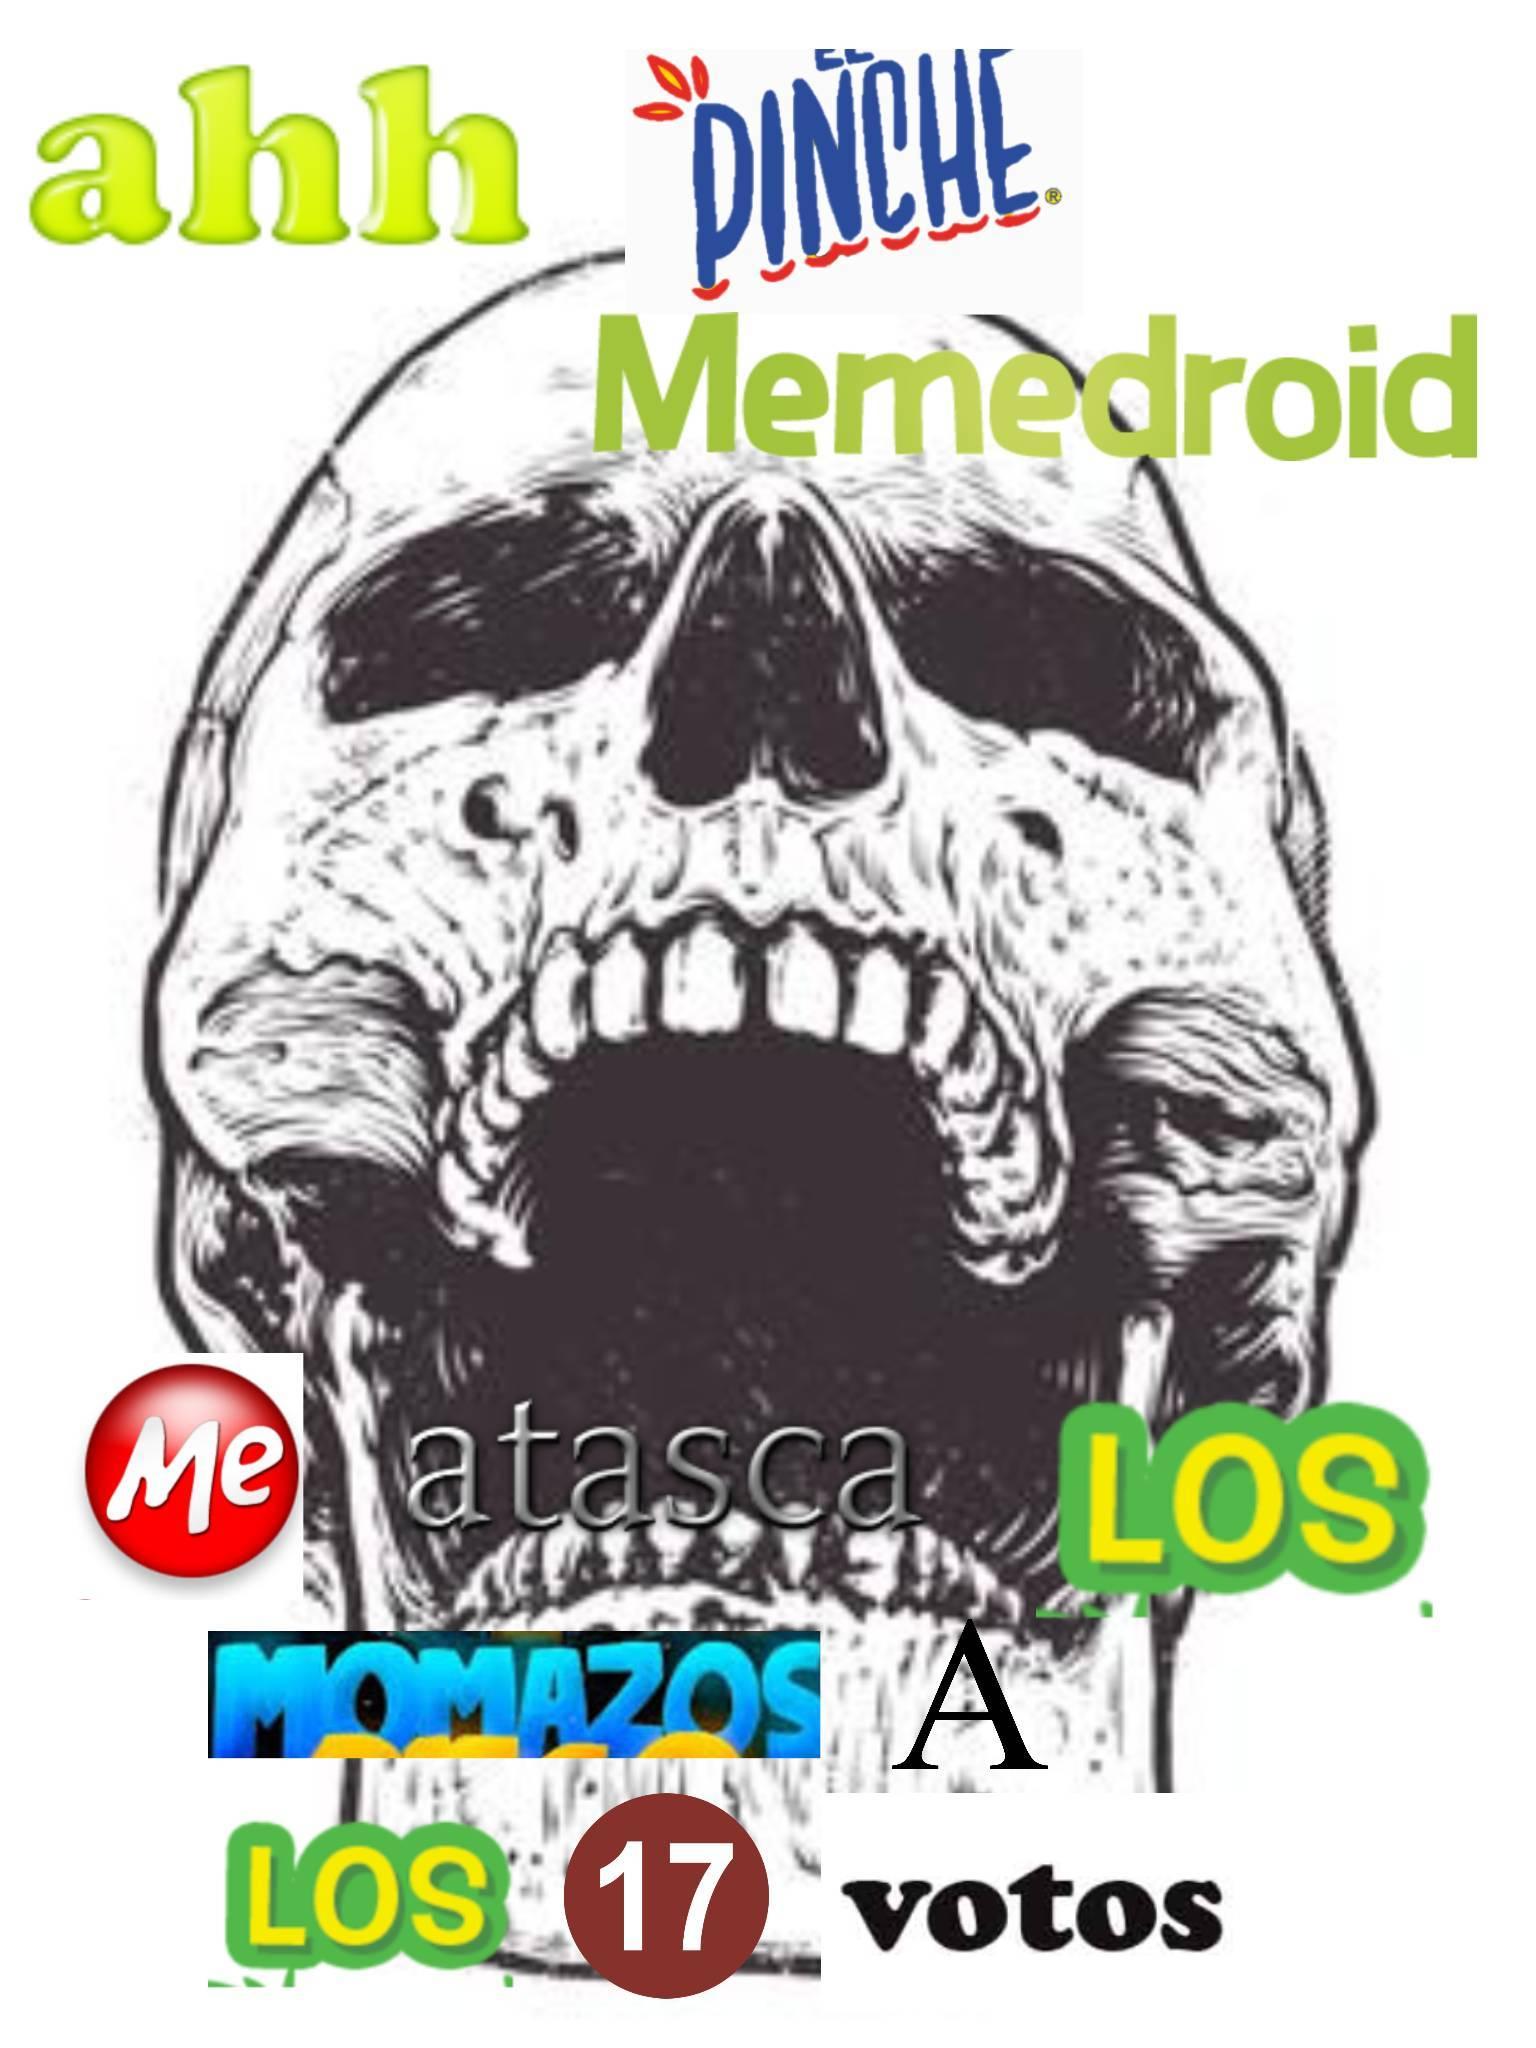 pinche momosdroid - meme